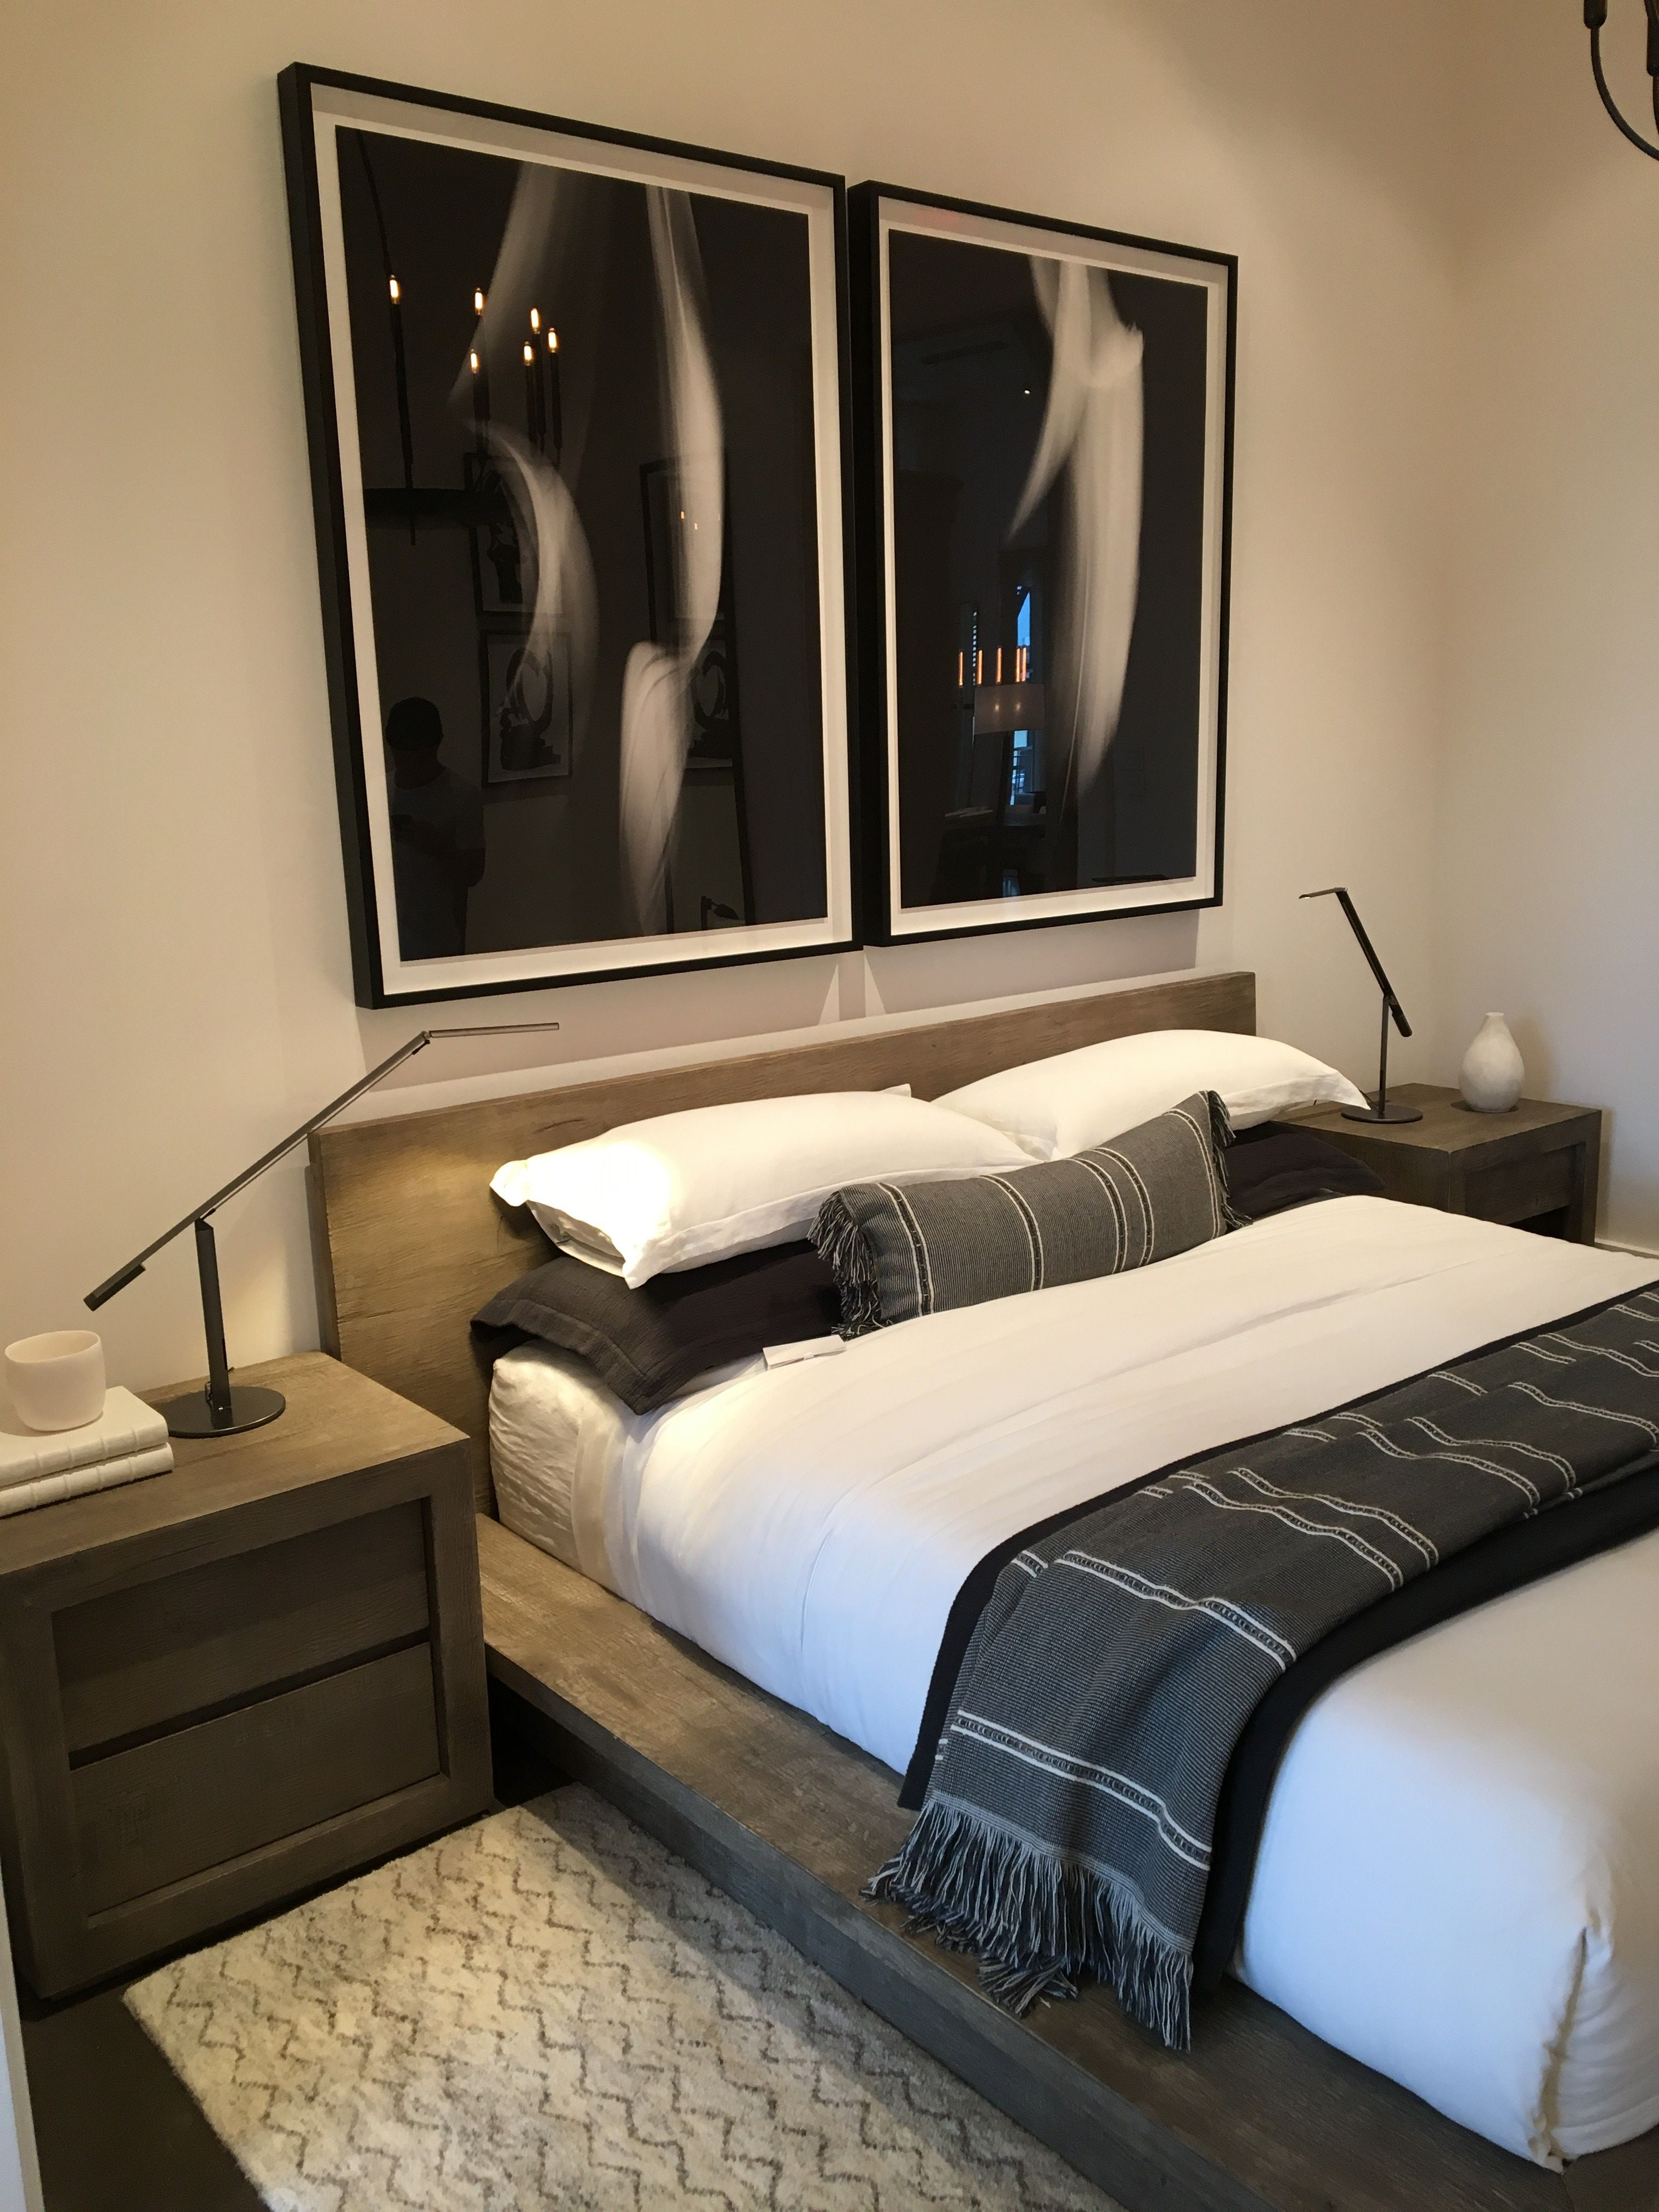 Restoration Hardware Bedroom, Austin TX Showroom